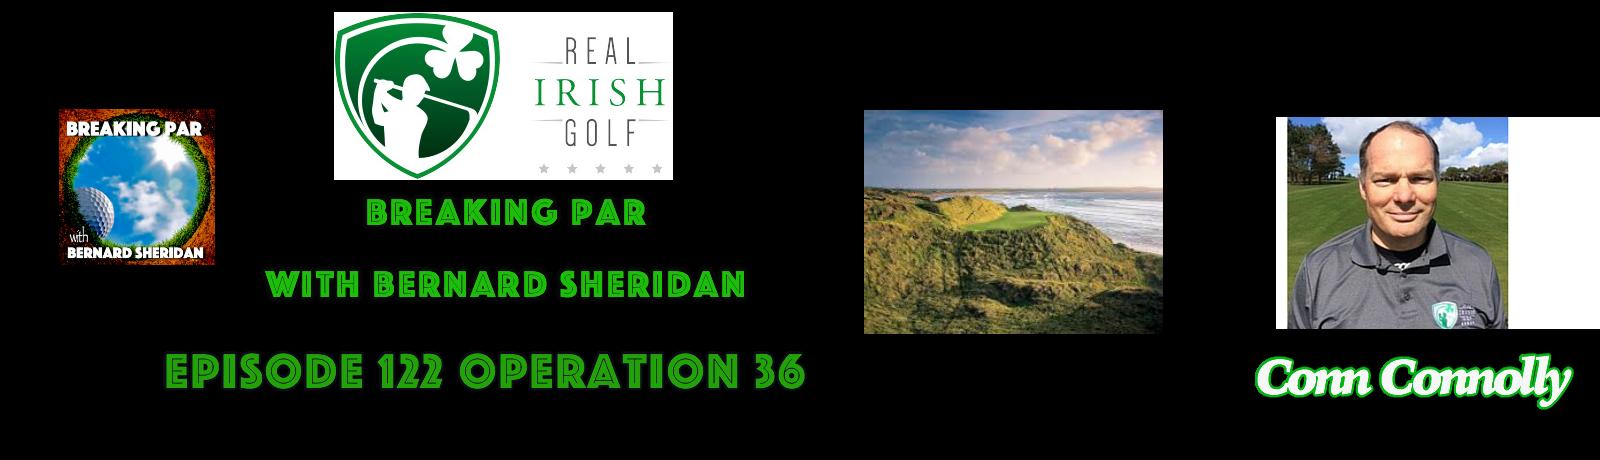 Breaking Par with Bernard Sheridan 123 Real Irish Golf Conn Connolly Header